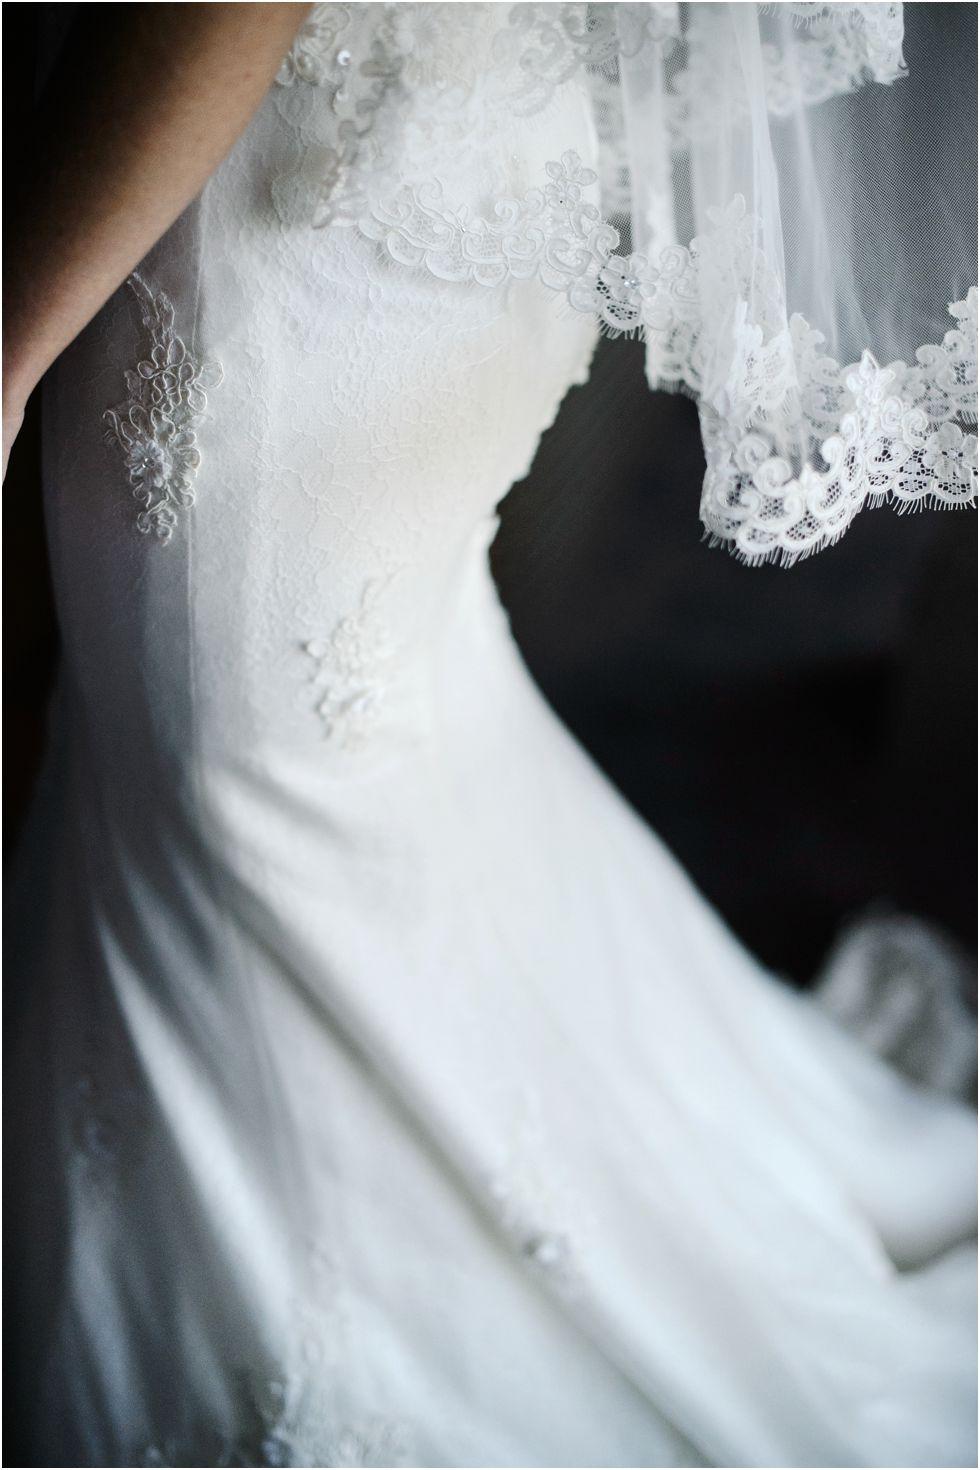 Hopetoun-House-wedding-photography-Edinburgh-20.jpg